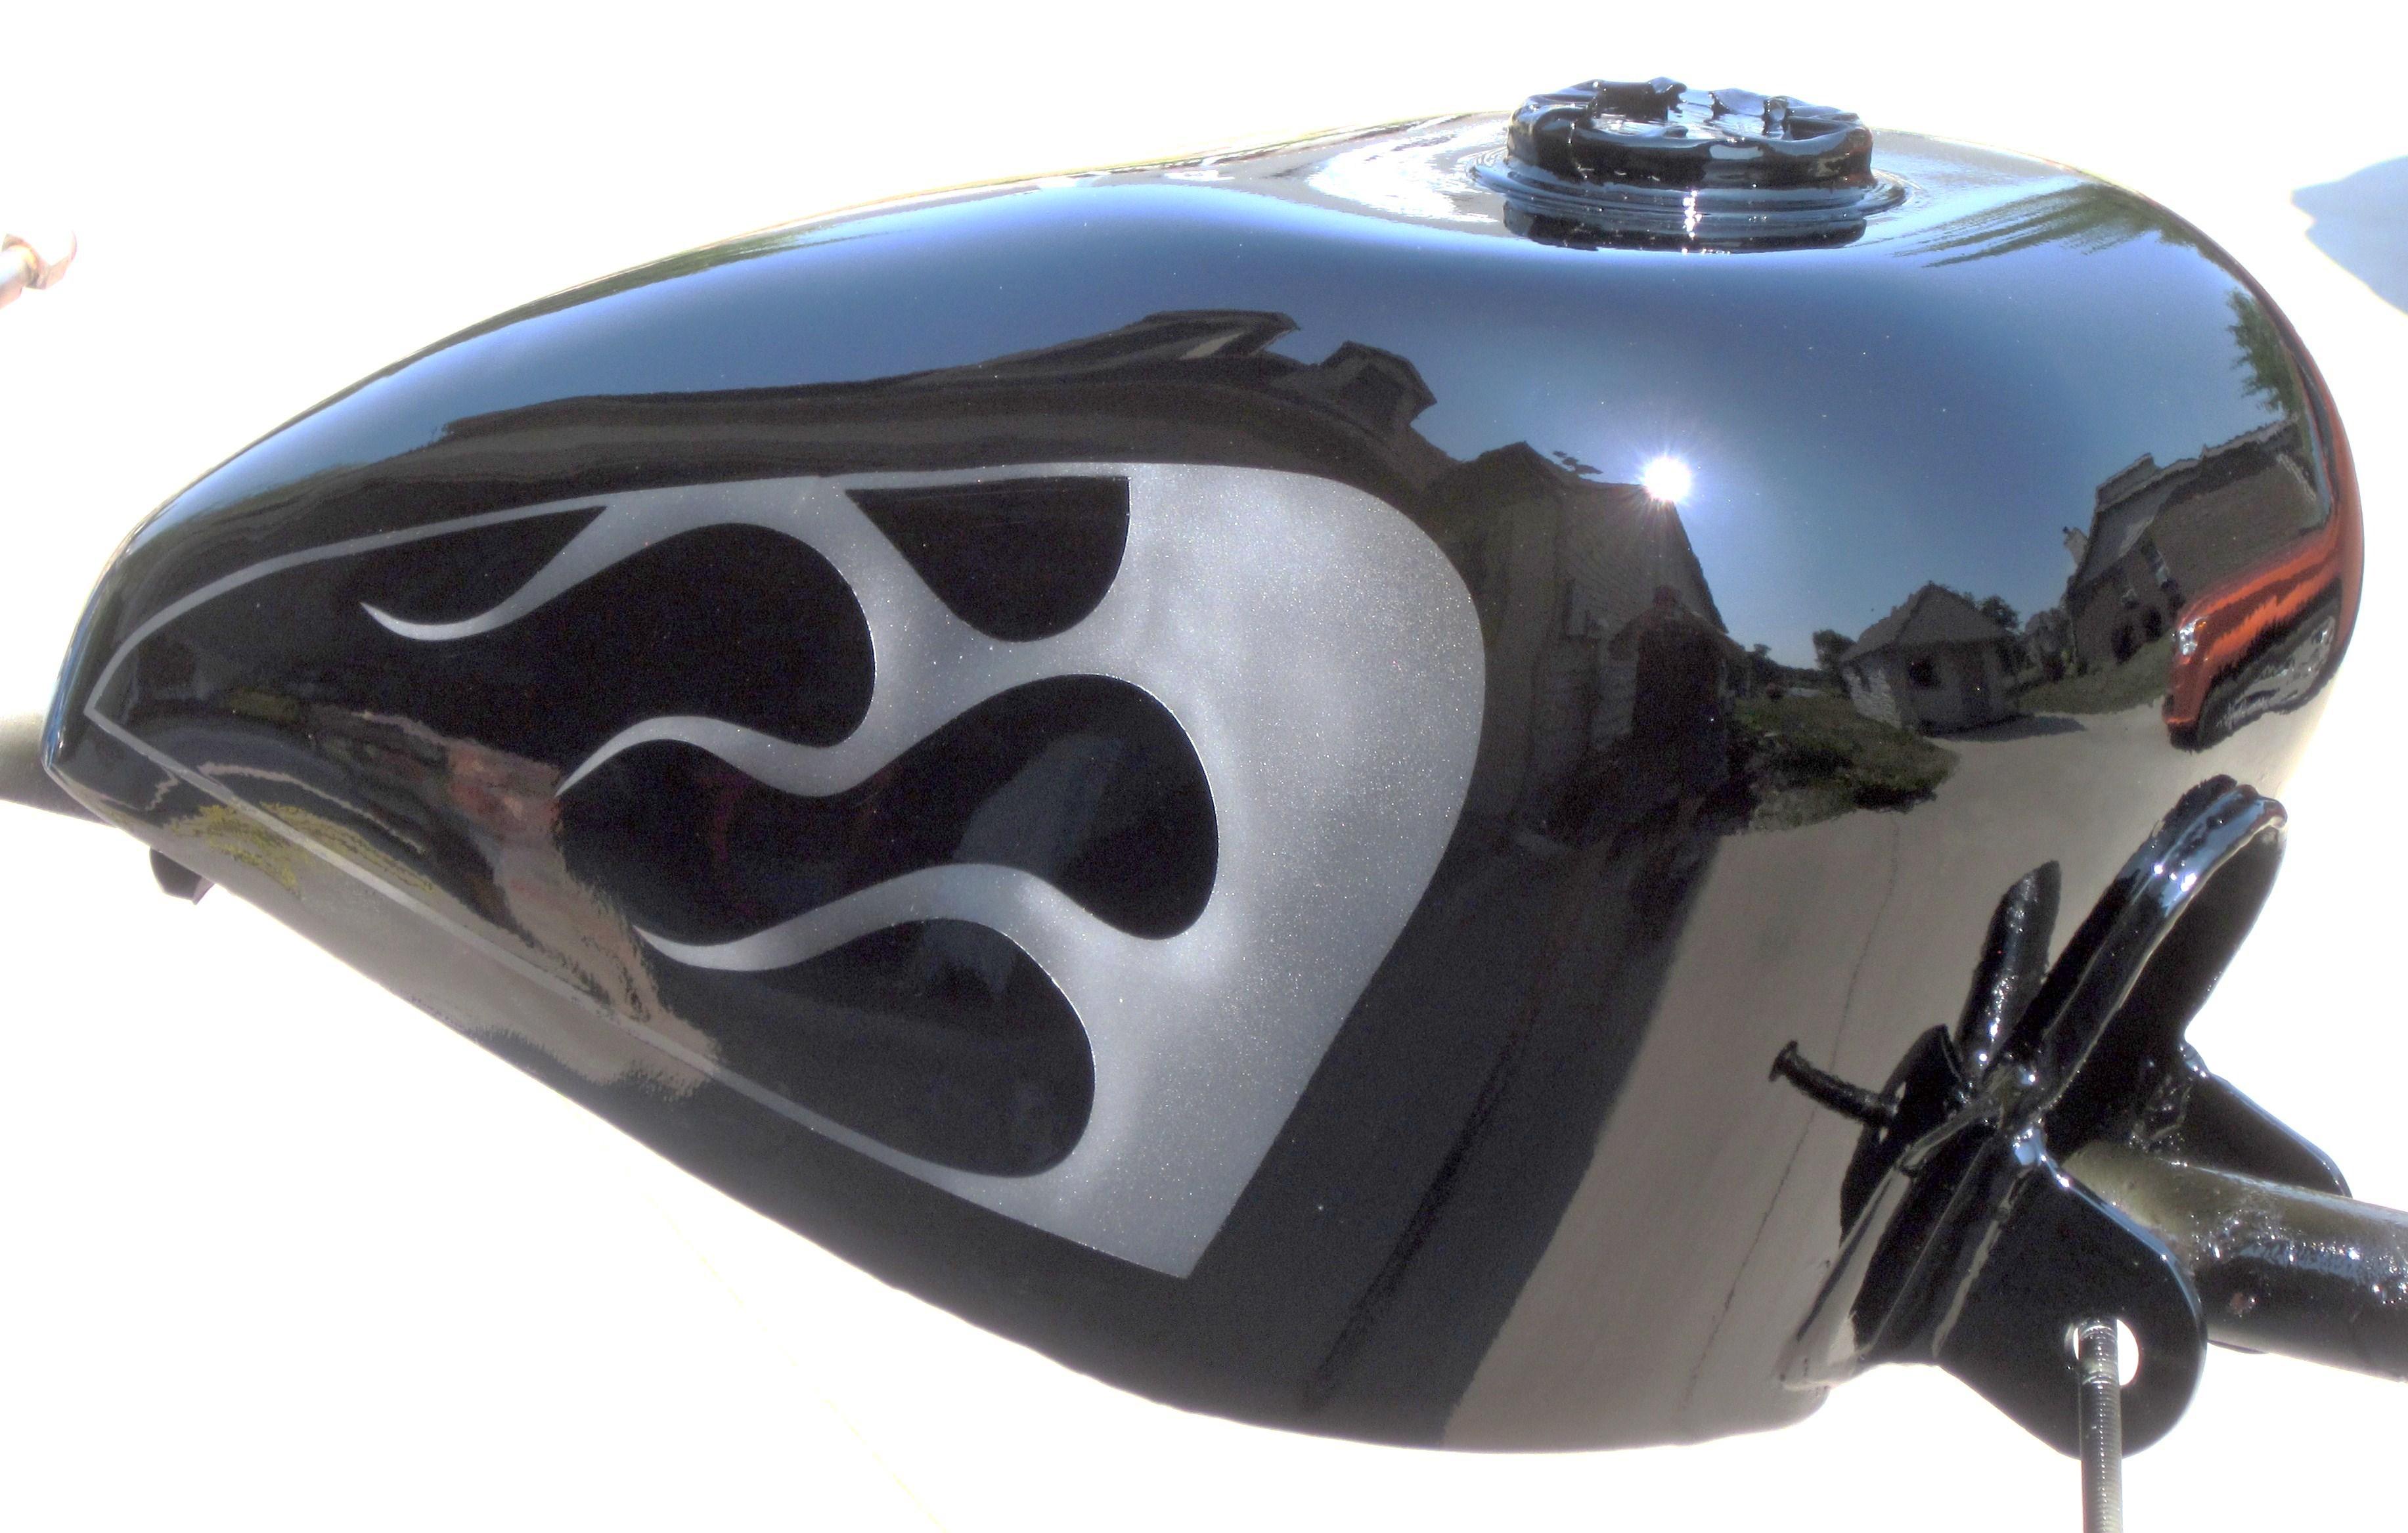 Click image for larger version  Name:bike, tank, paint gun 015.JPG Views:5854 Size:1.05 MB ID:66332